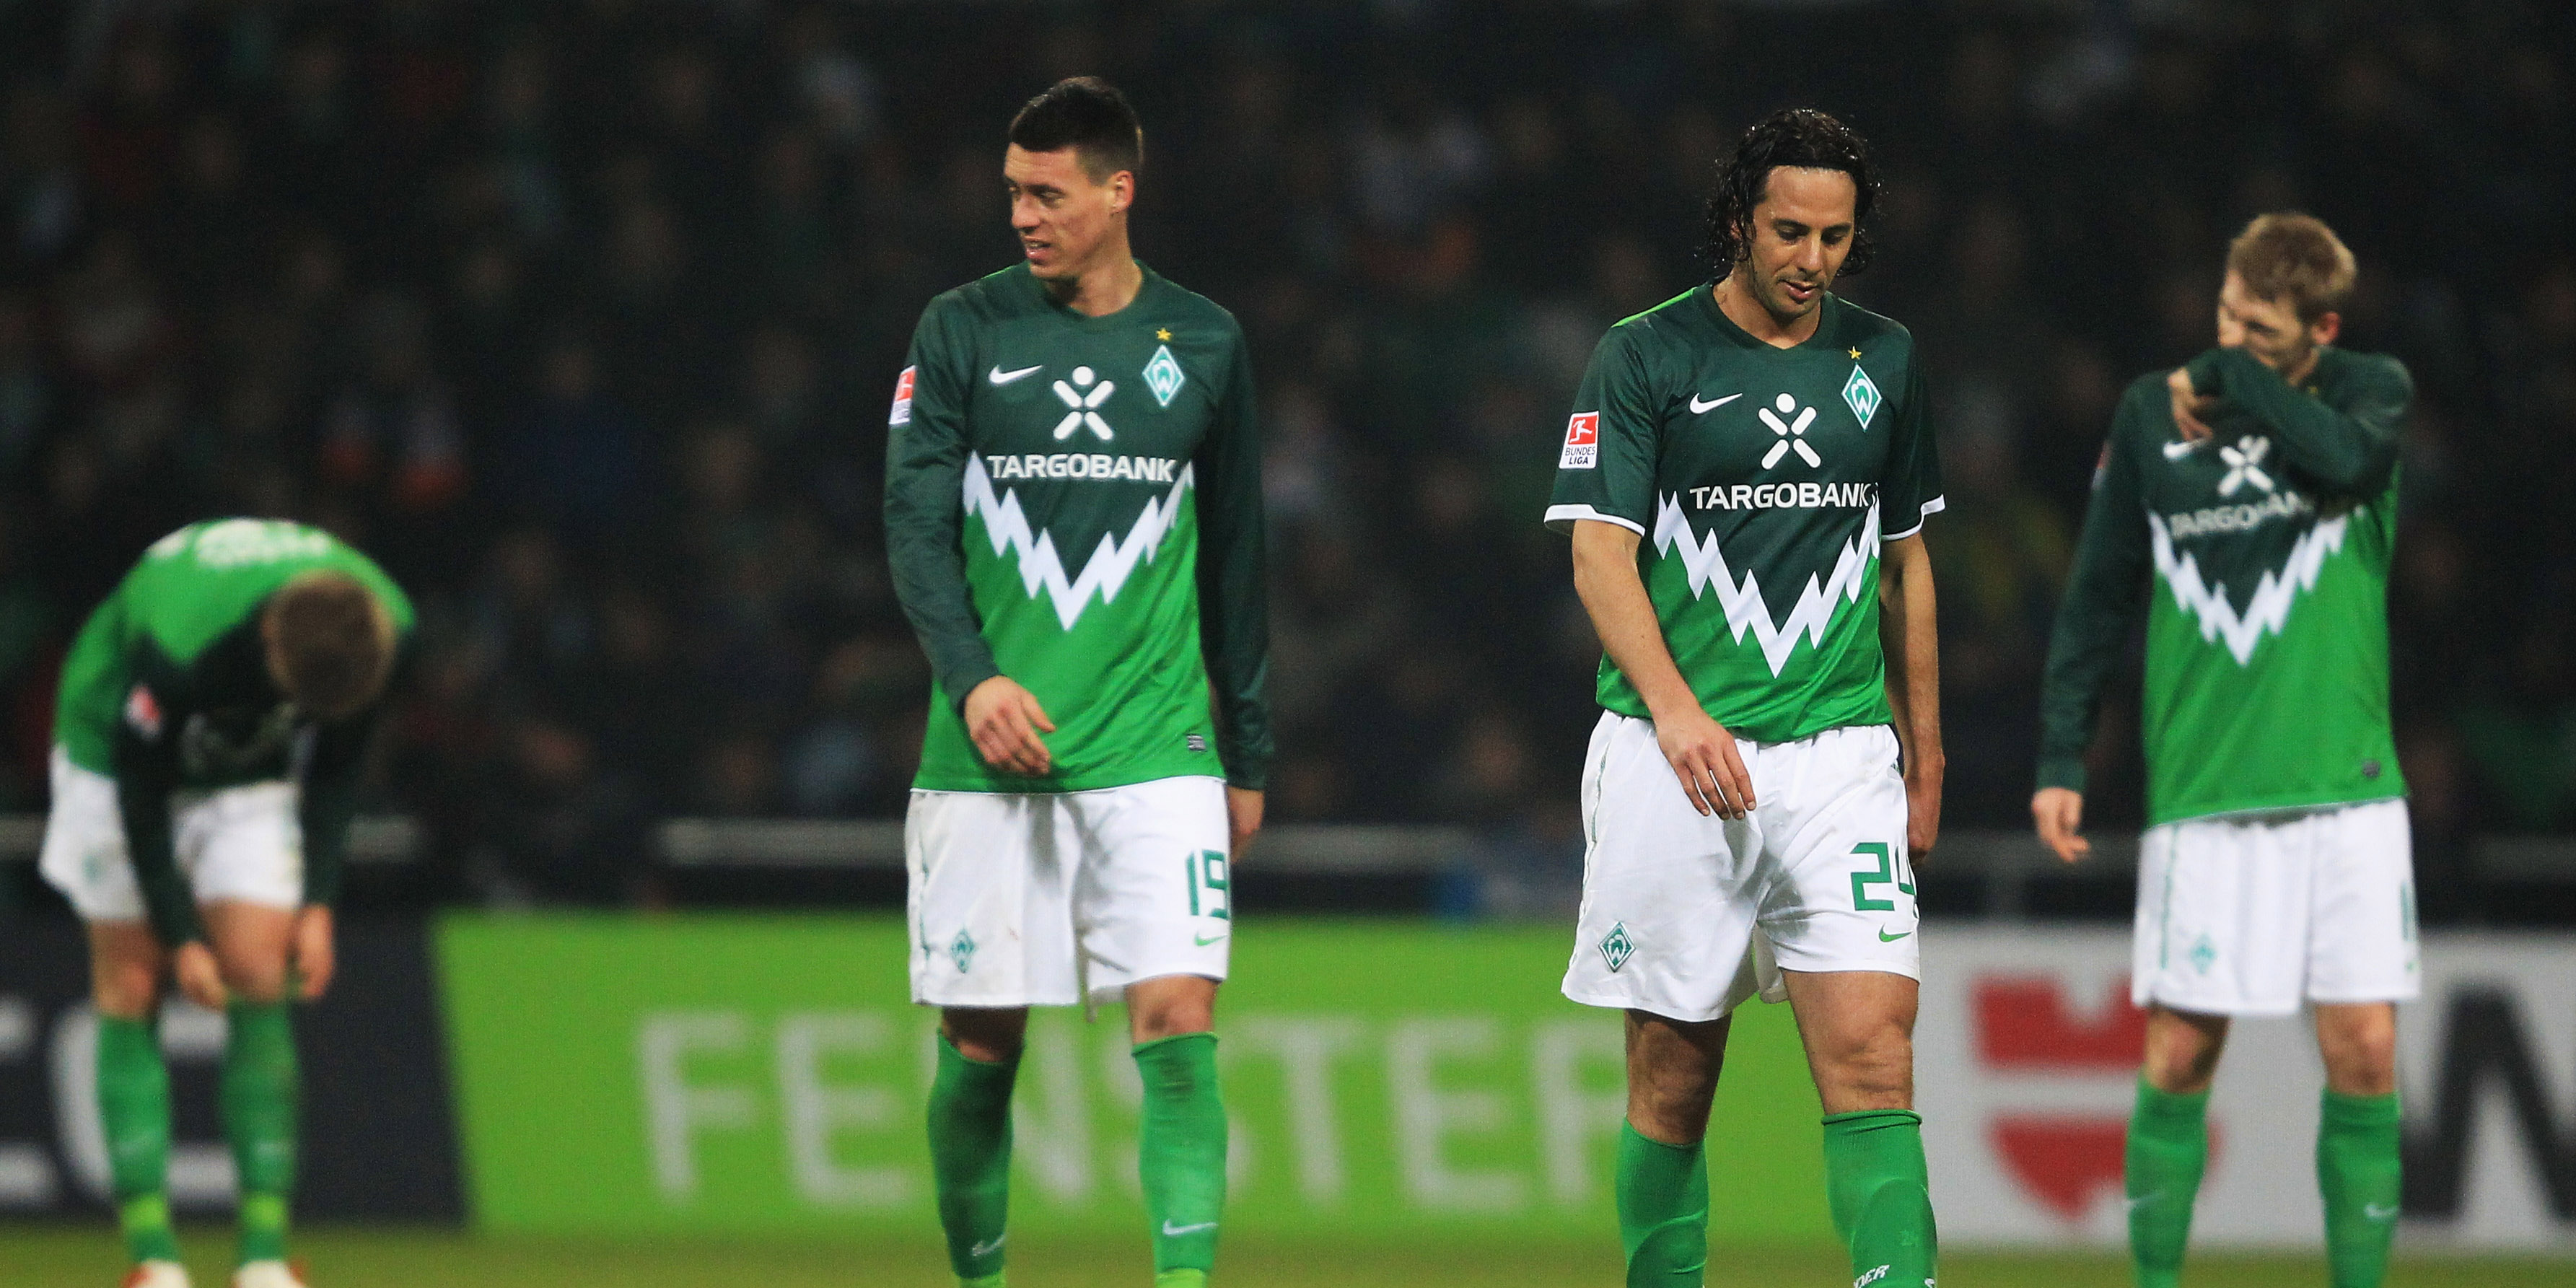 Wagner, Pizarro